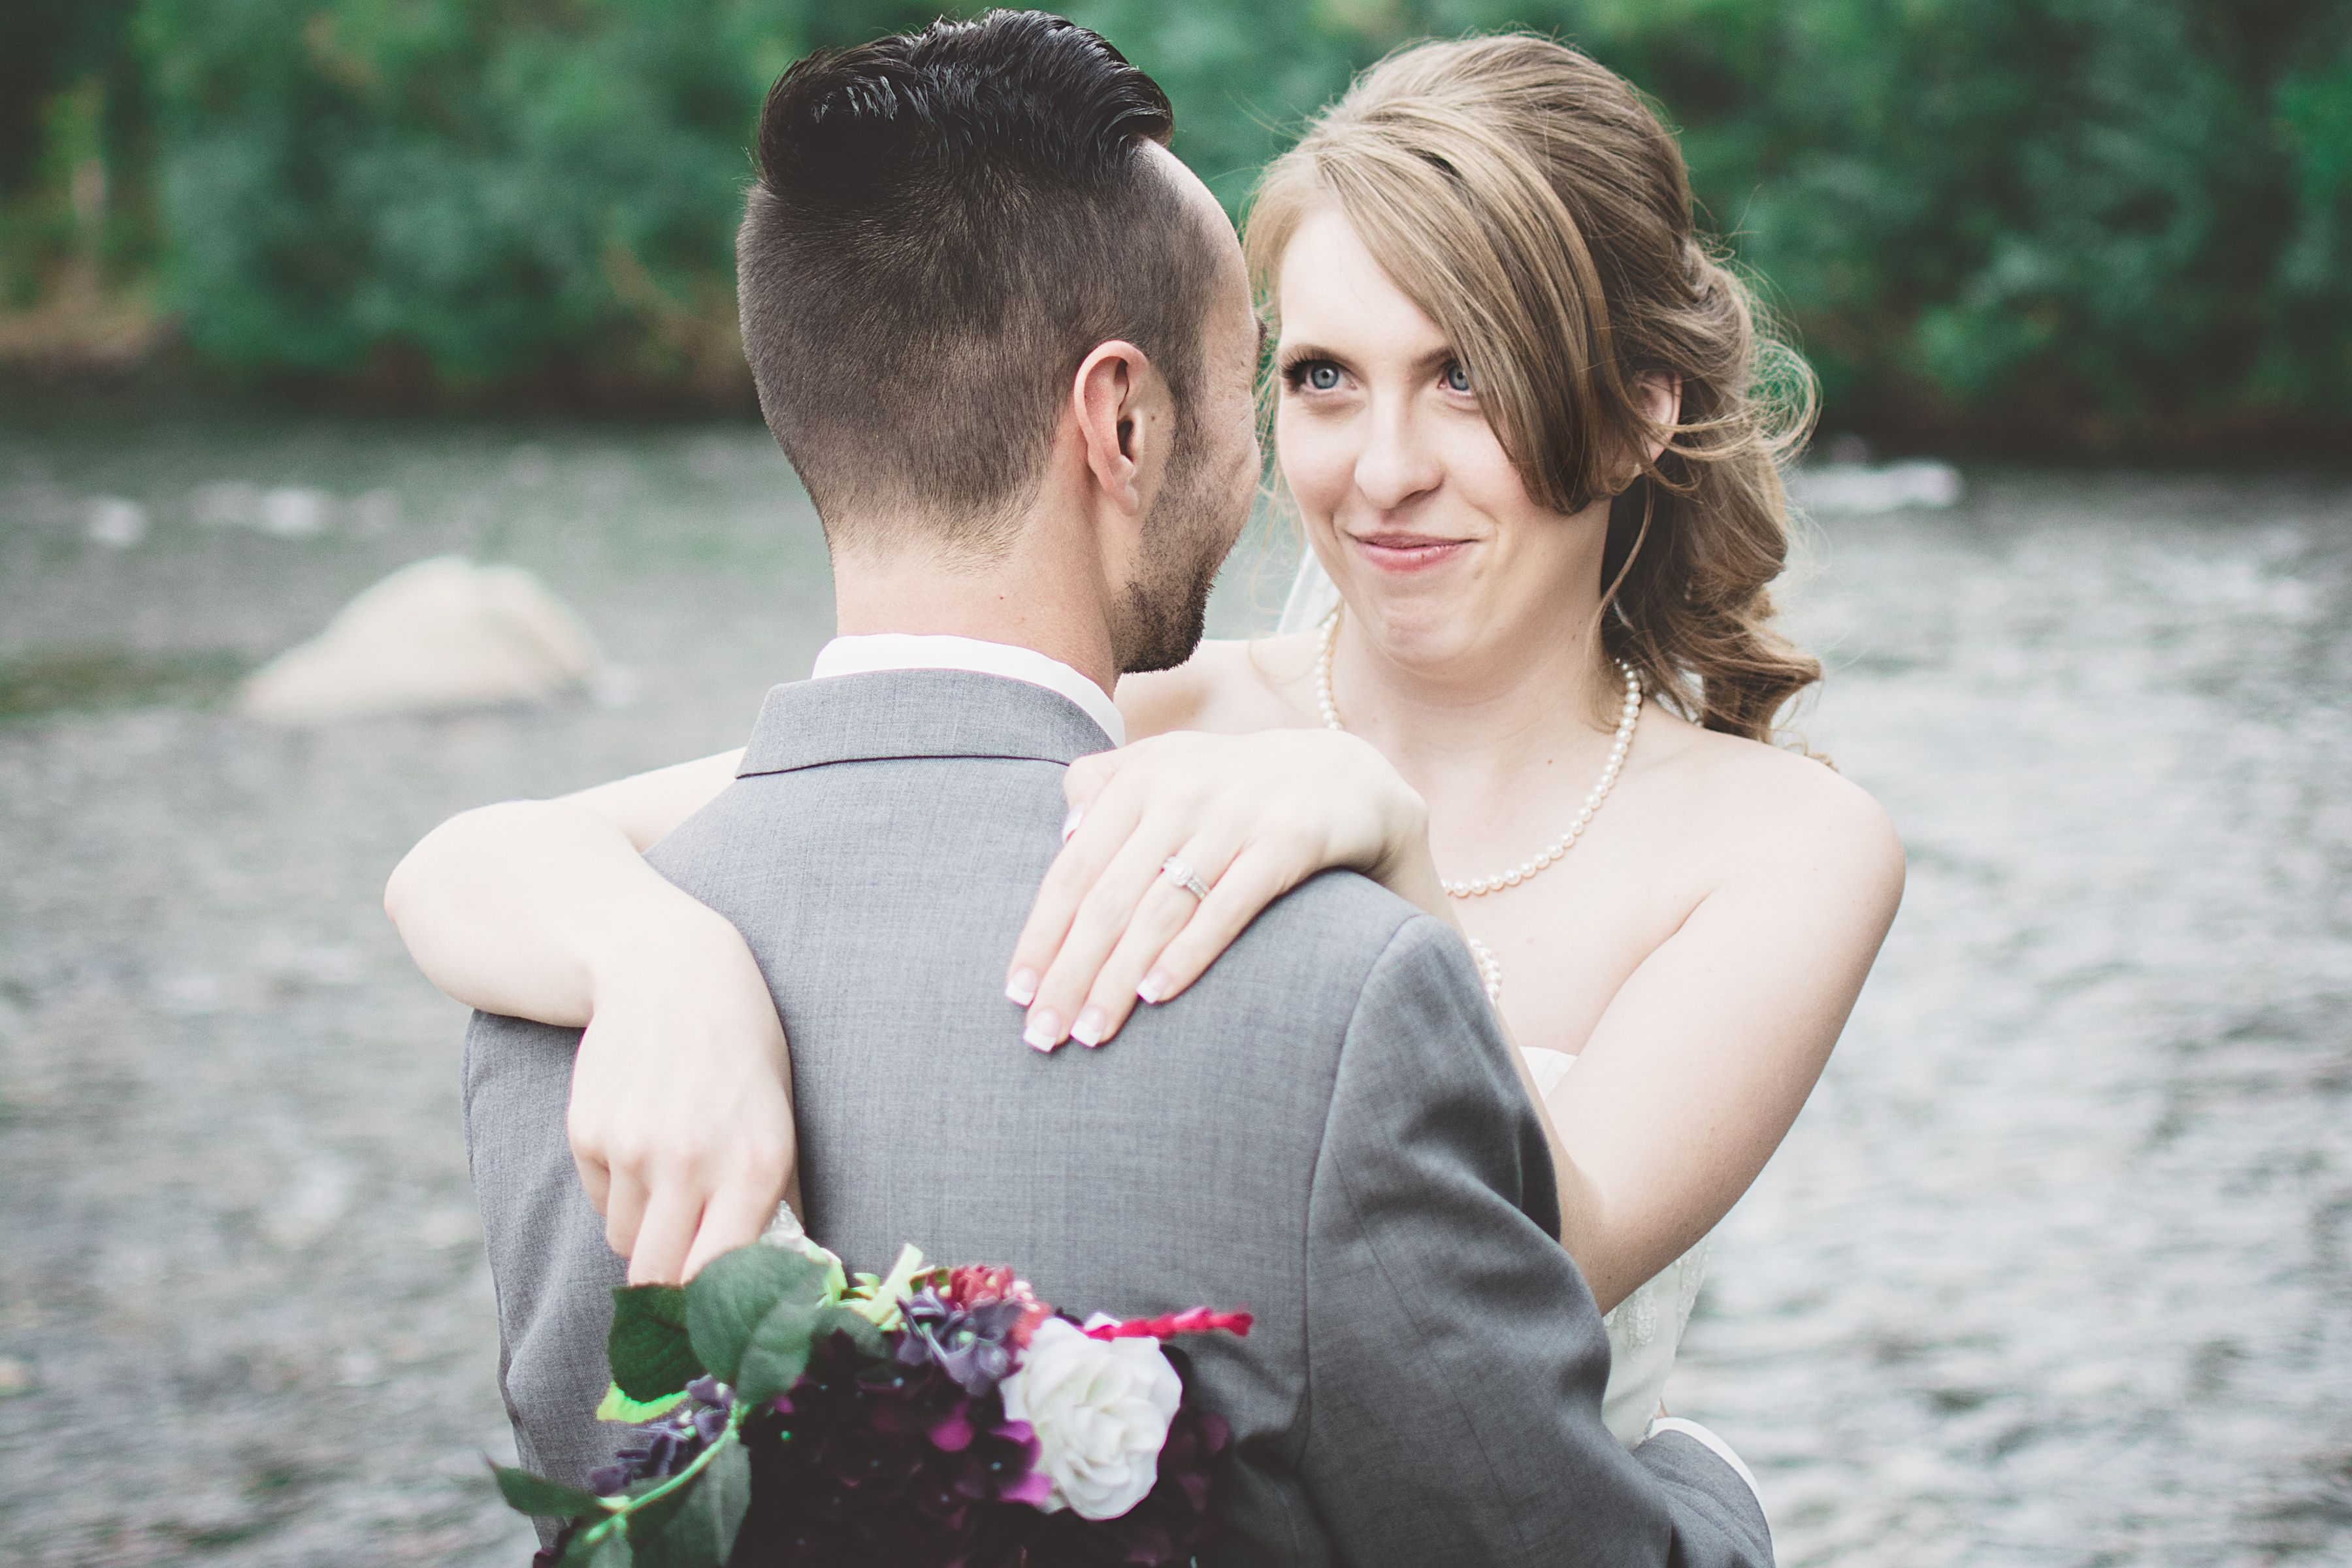 Amy kevin wedding taylor english photography taylor english